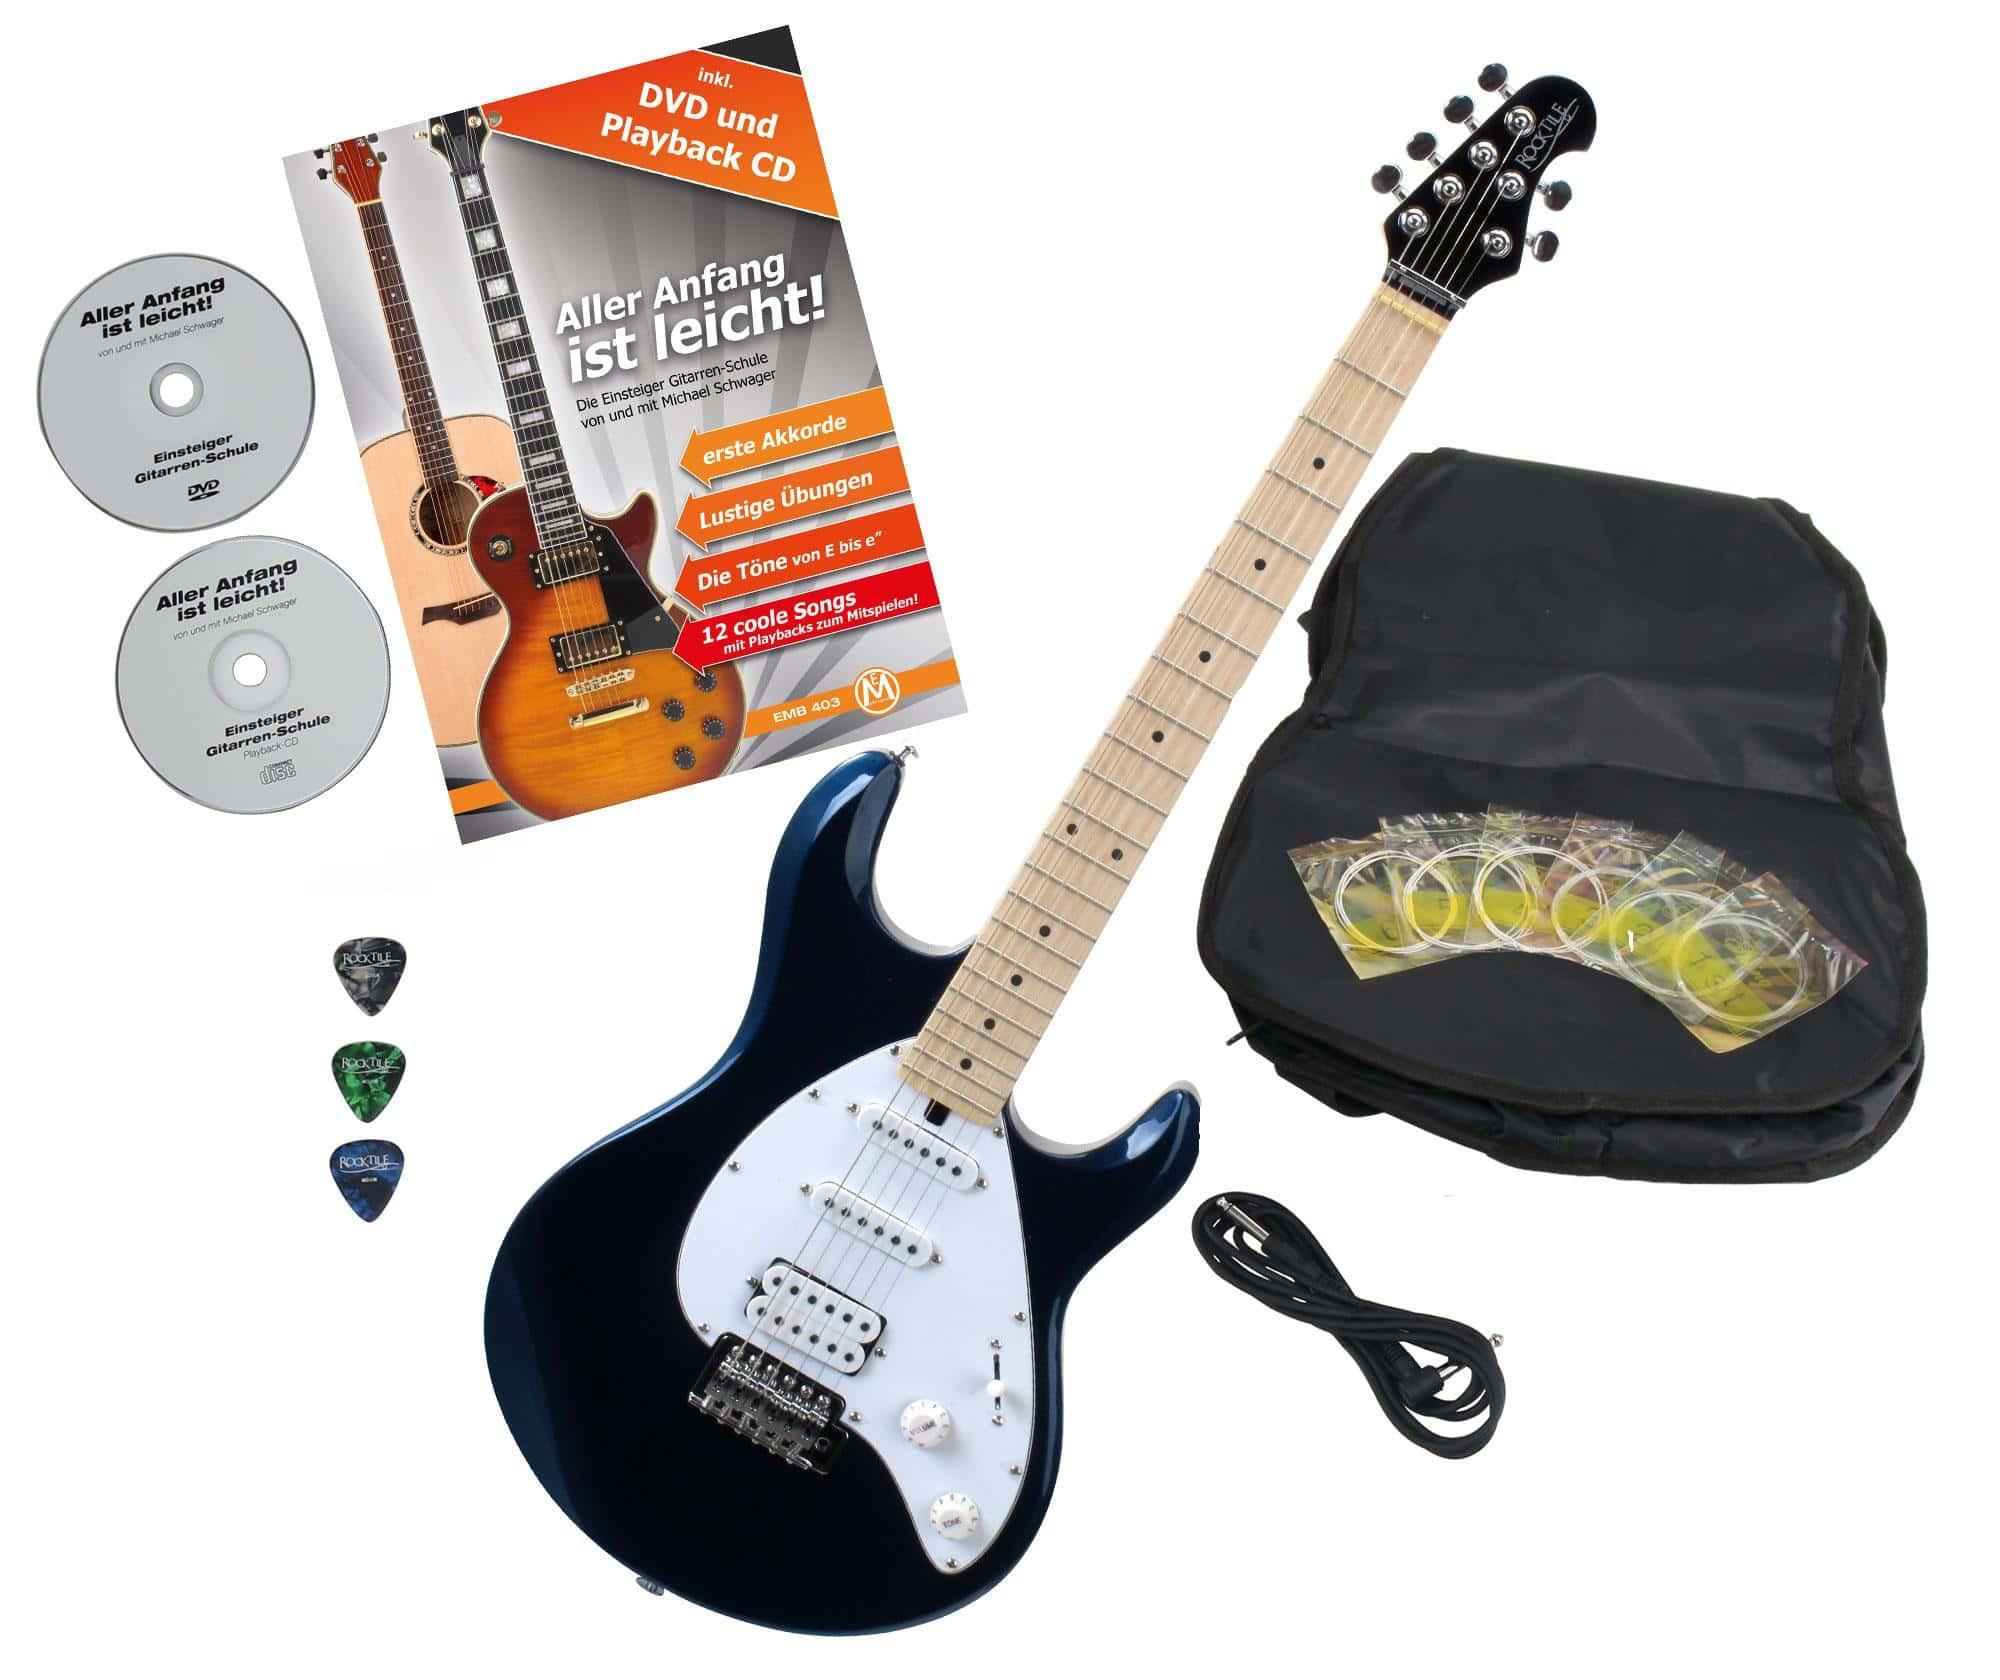 Rocktile Pro MM250 MB E Gitarre Metallic Blue mit Zubehör